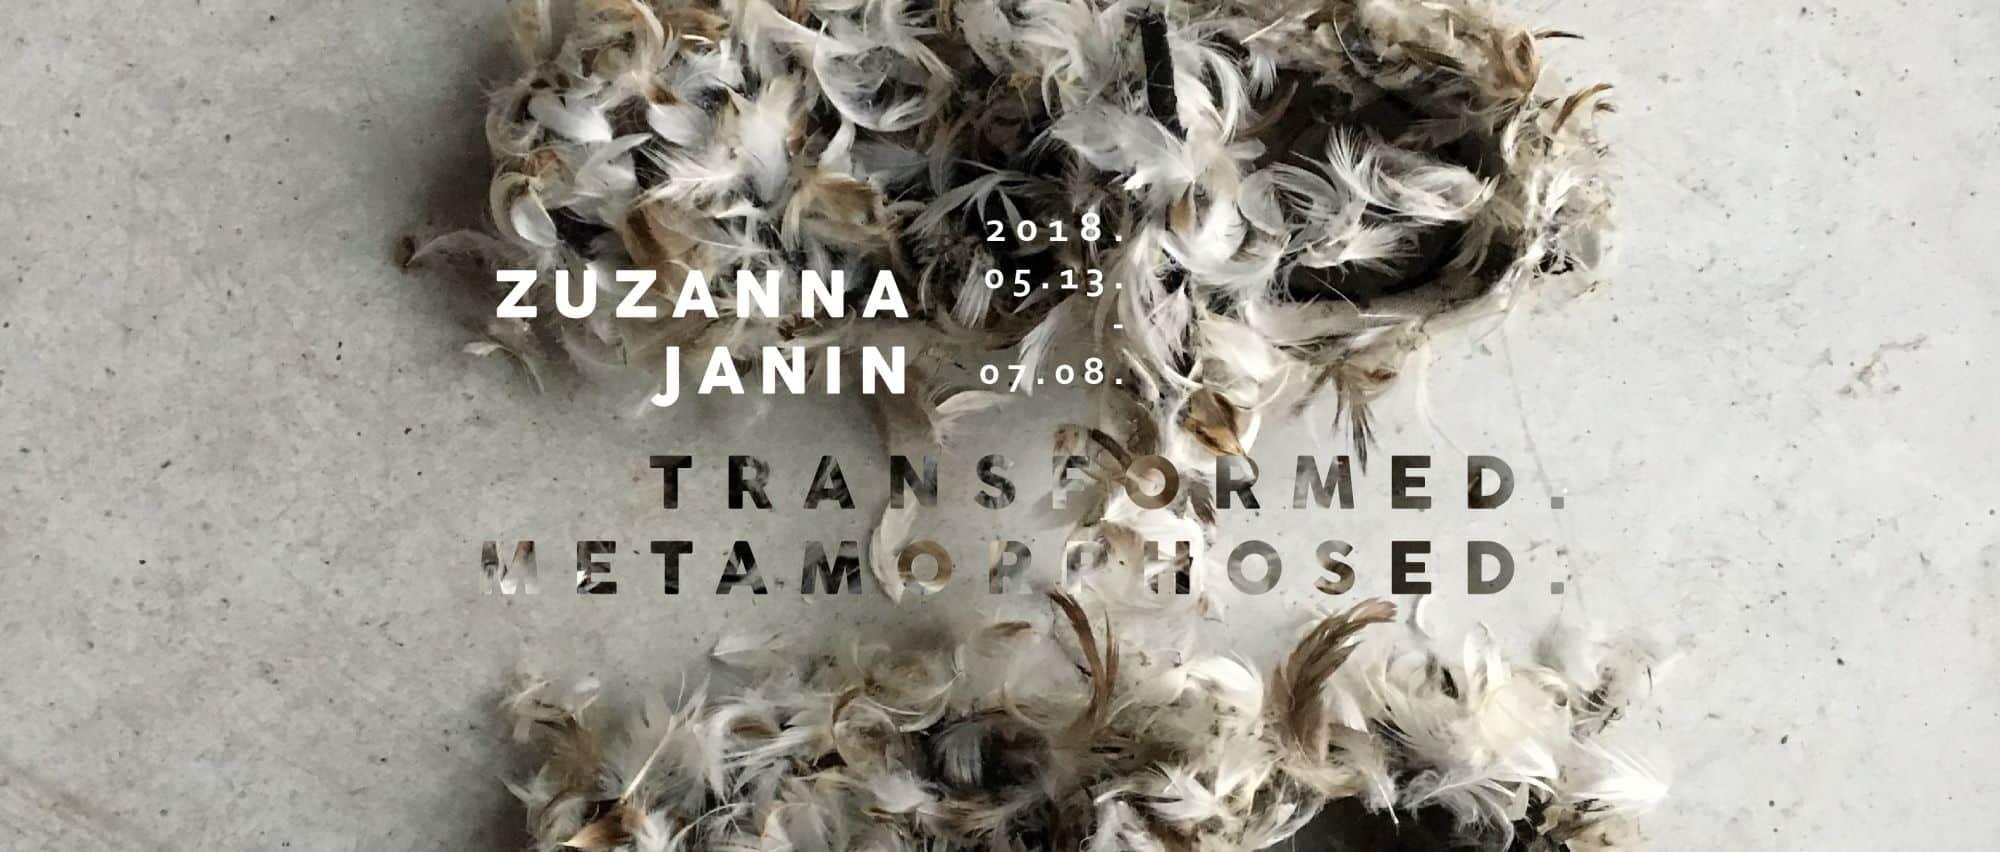 Zuzanna Janin exhibition